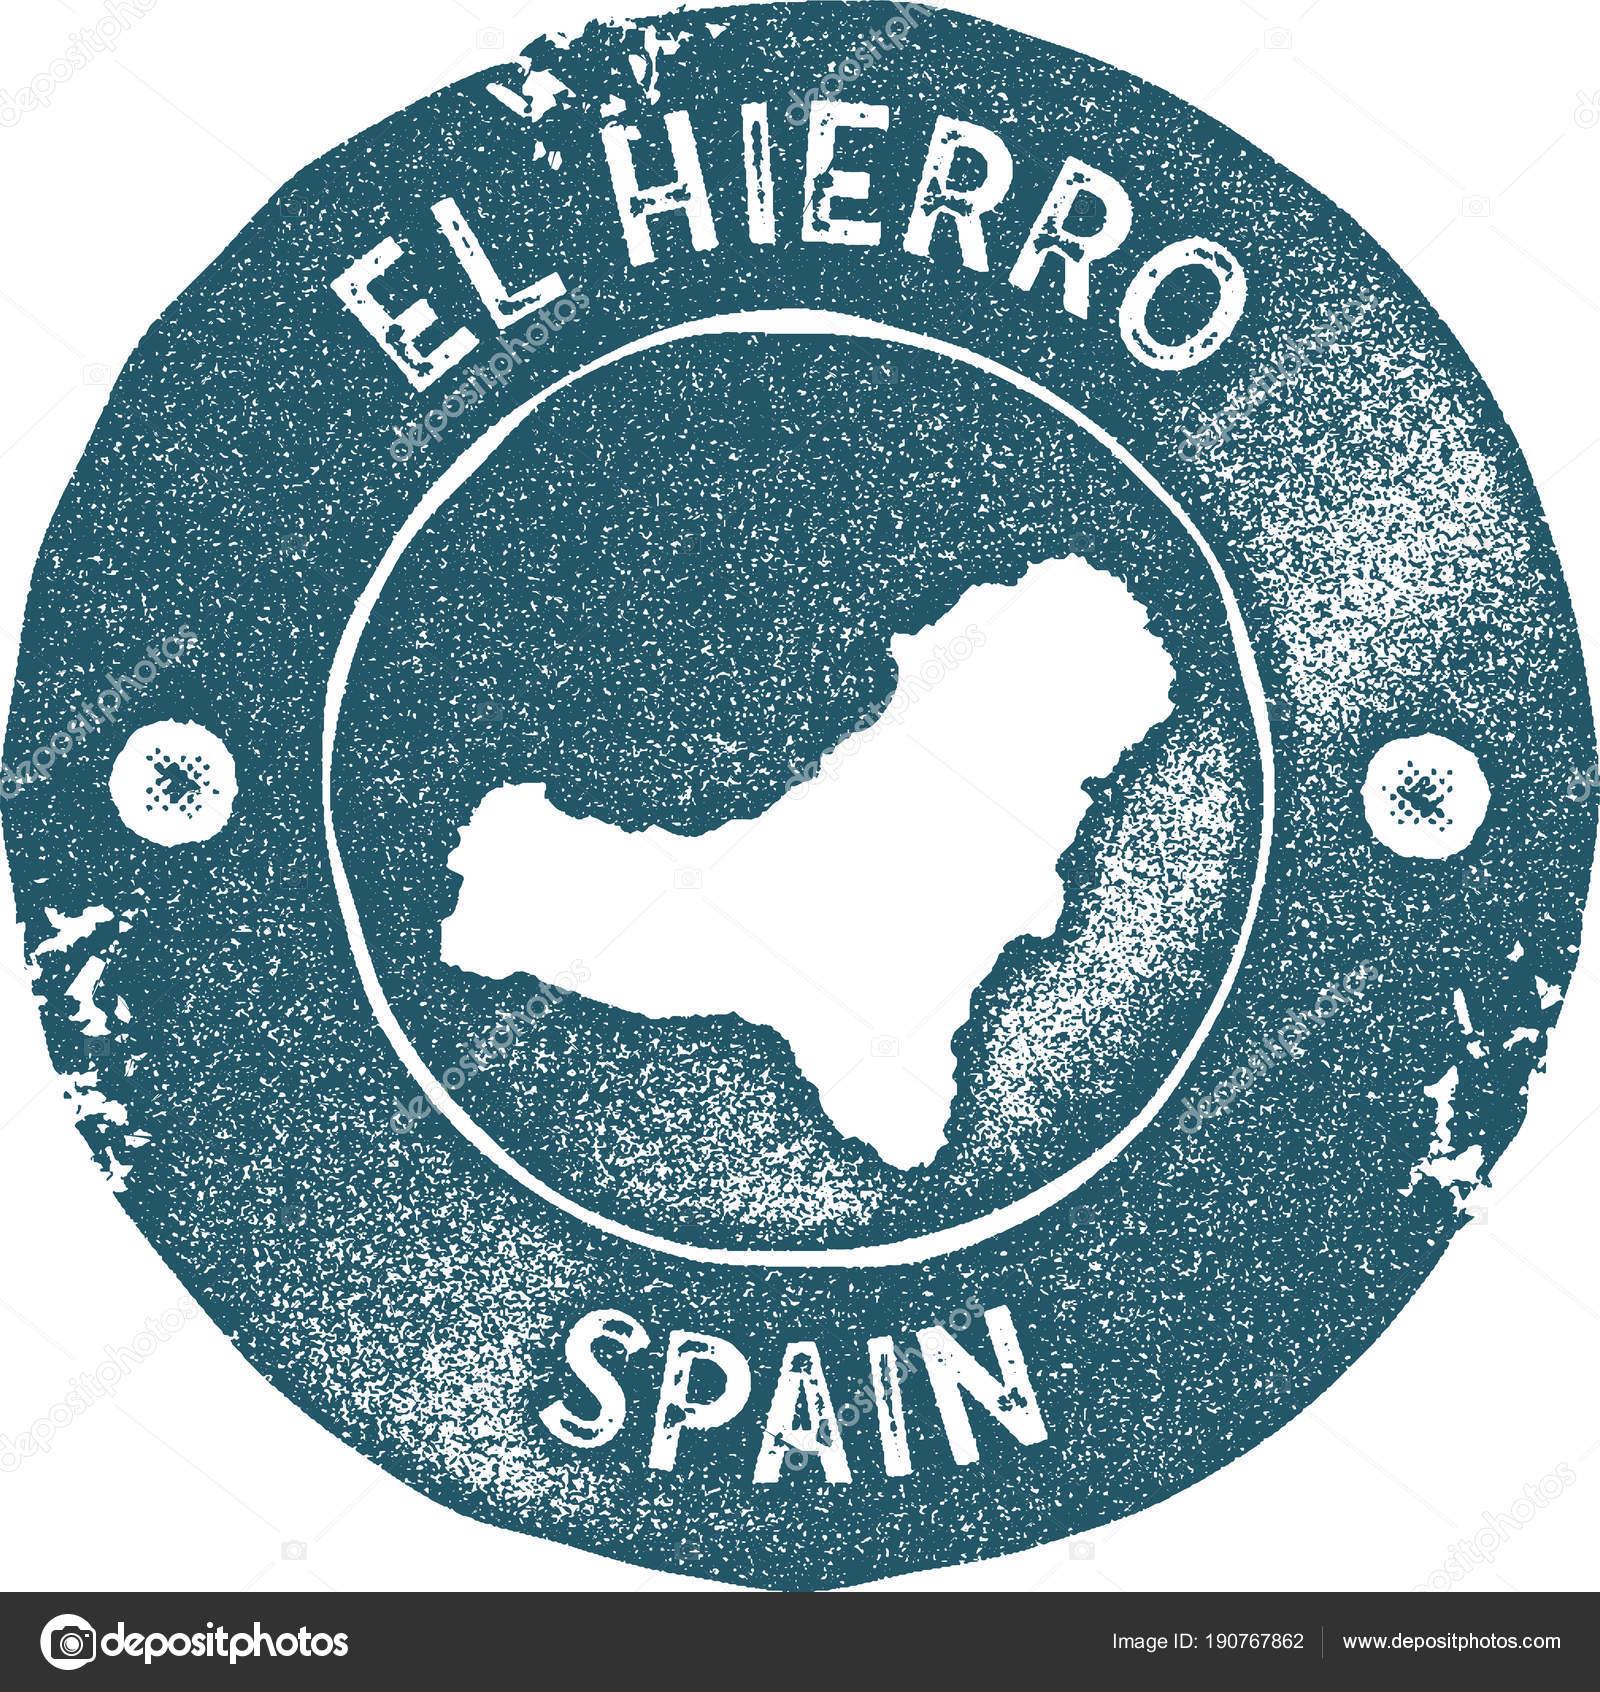 El Hierro map vintage stamp Retro style handmade label badge or